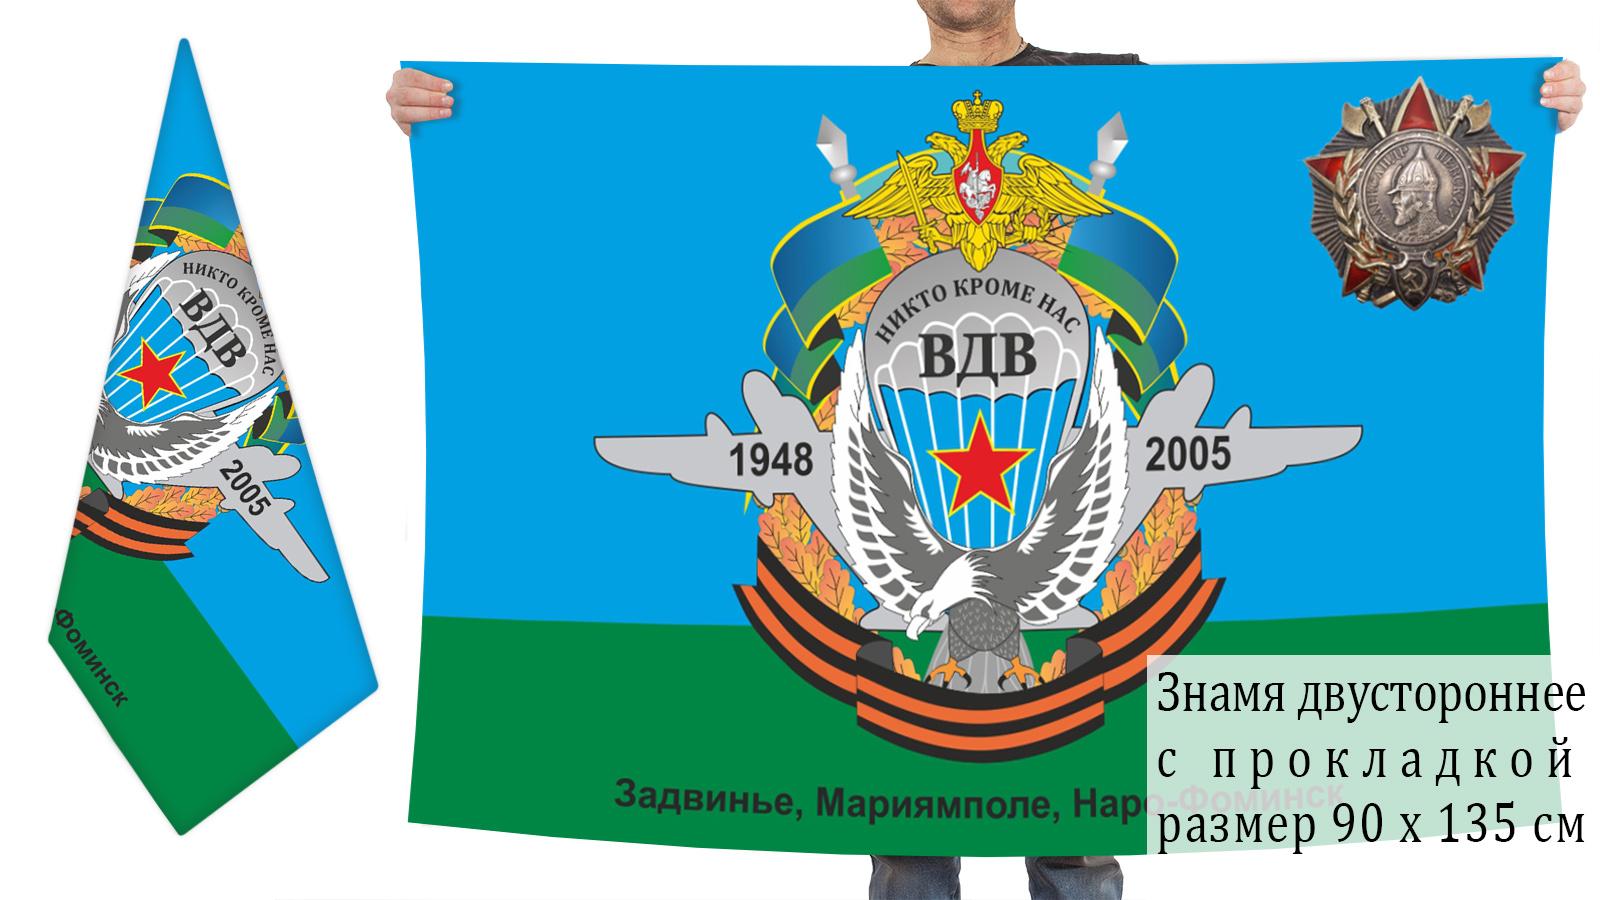 Двусторонний флаг ВДВ с орлом и Орденом Невского